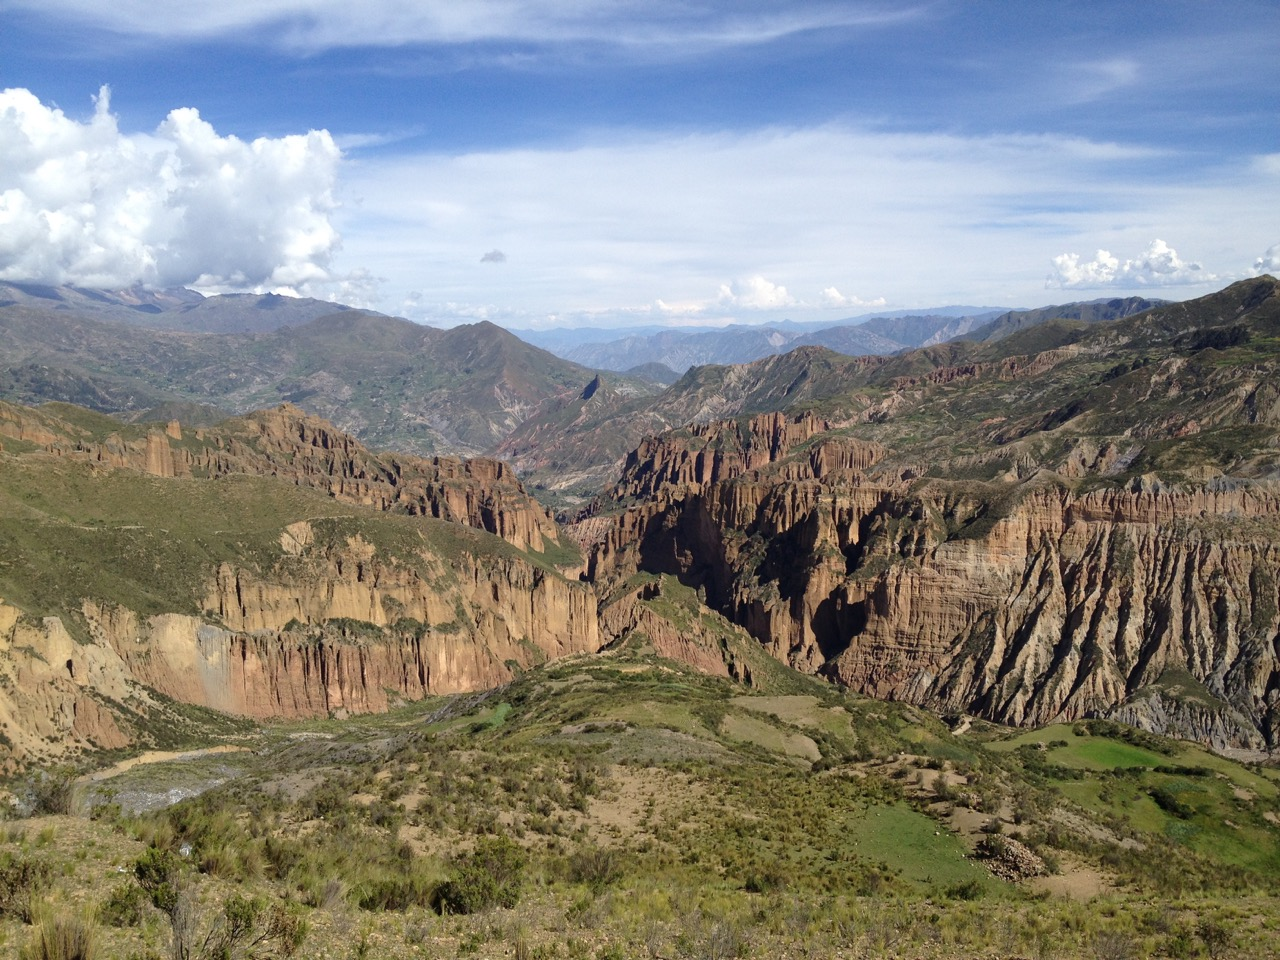 Cañon de Palca, La Paz, Bolivia